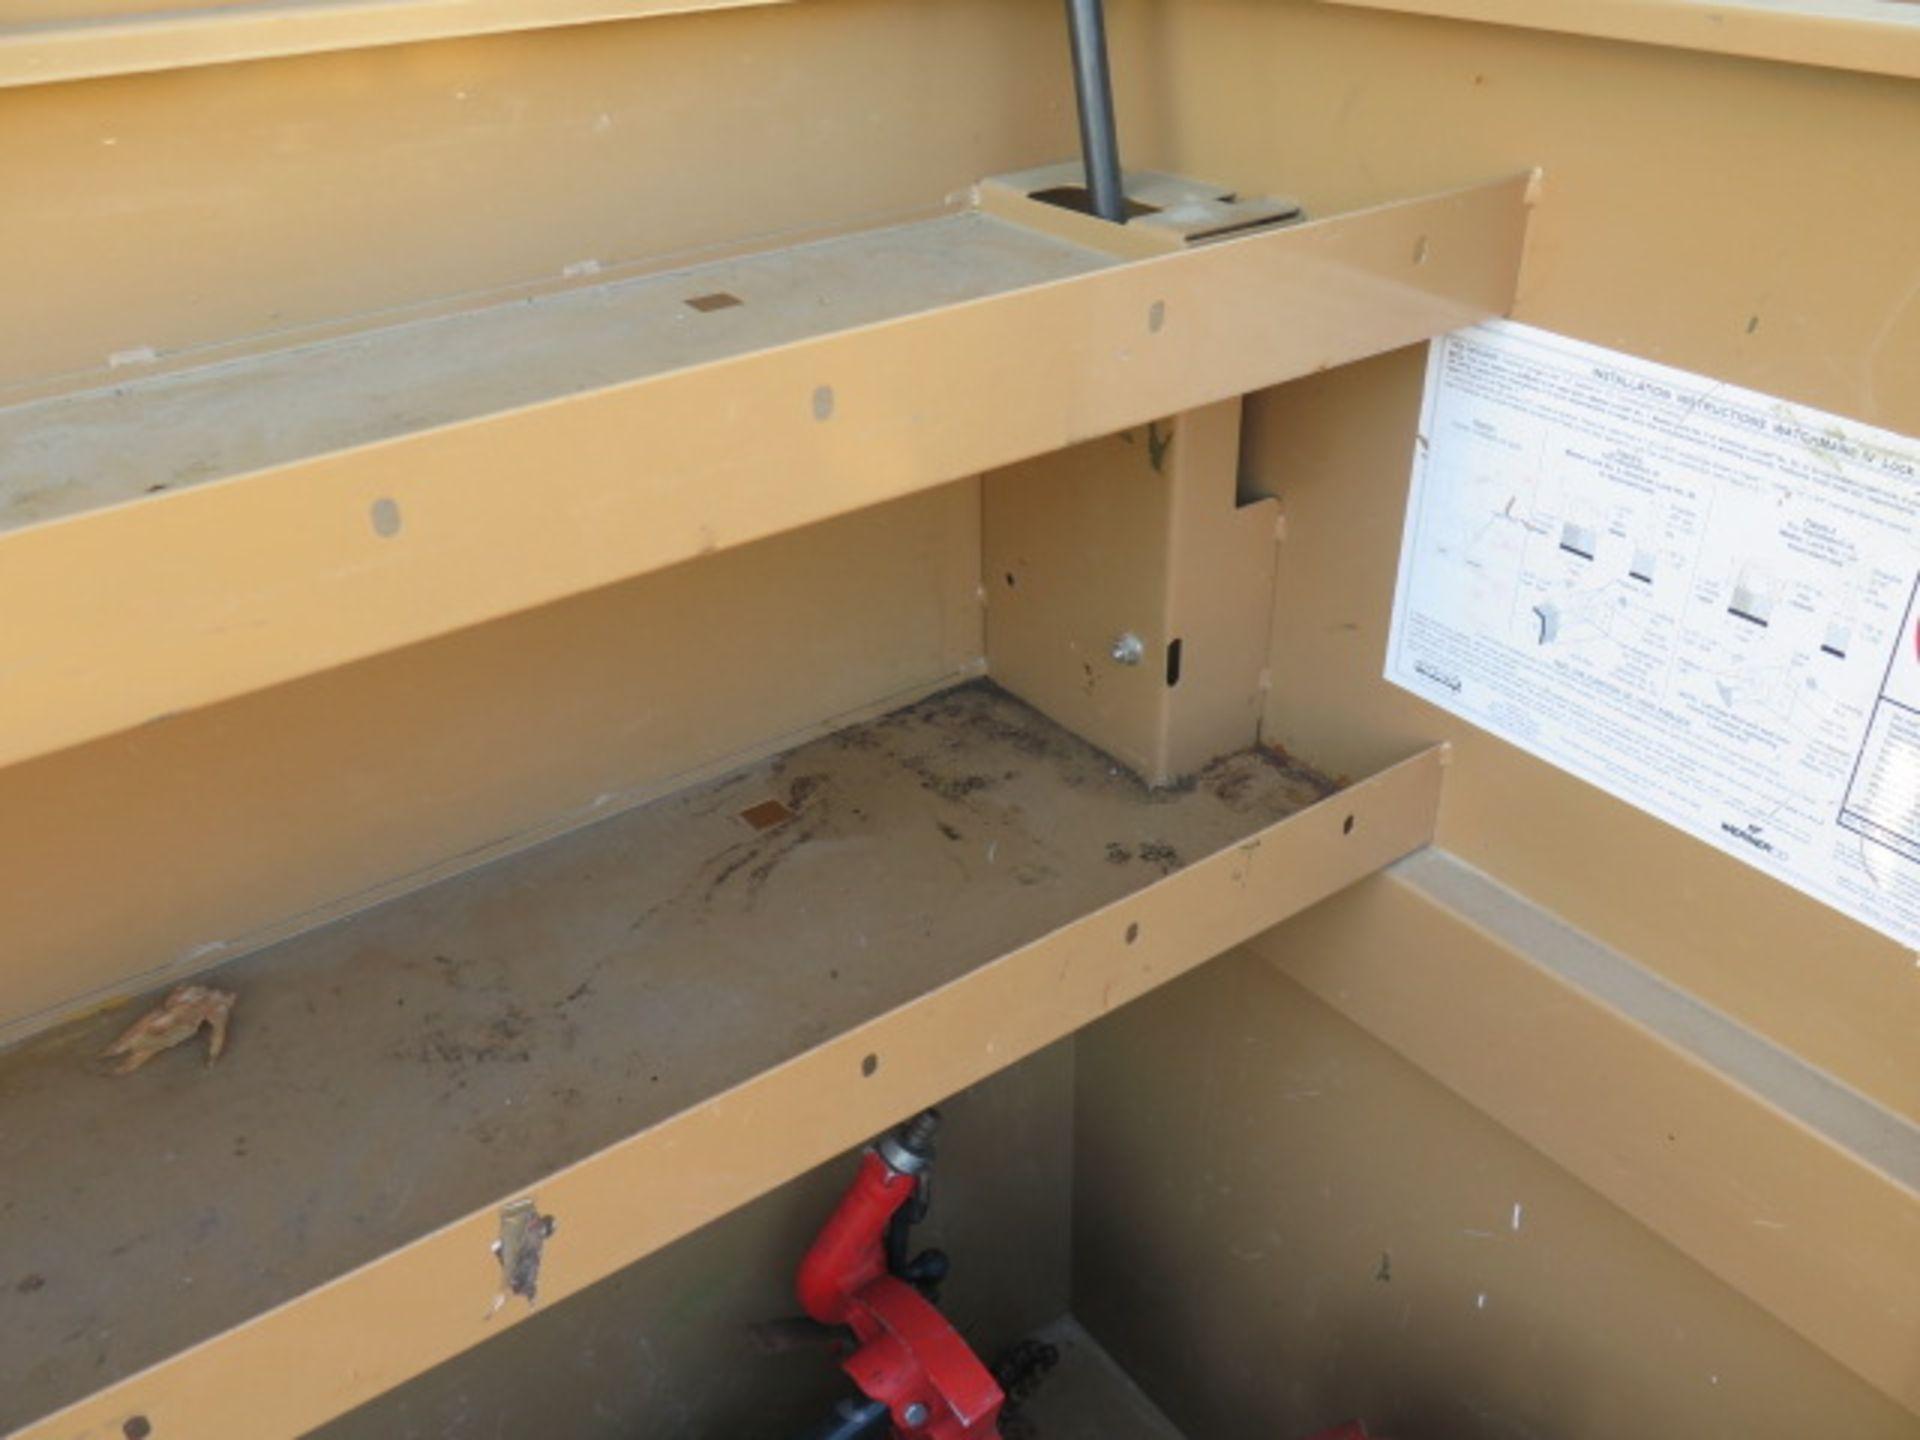 Knaack mdl. 89 Storagemaster Rolling Job Box w/ Ridgid Tri-Stands (SOLD AS-IS - NO WARRANTY) - Image 7 of 11